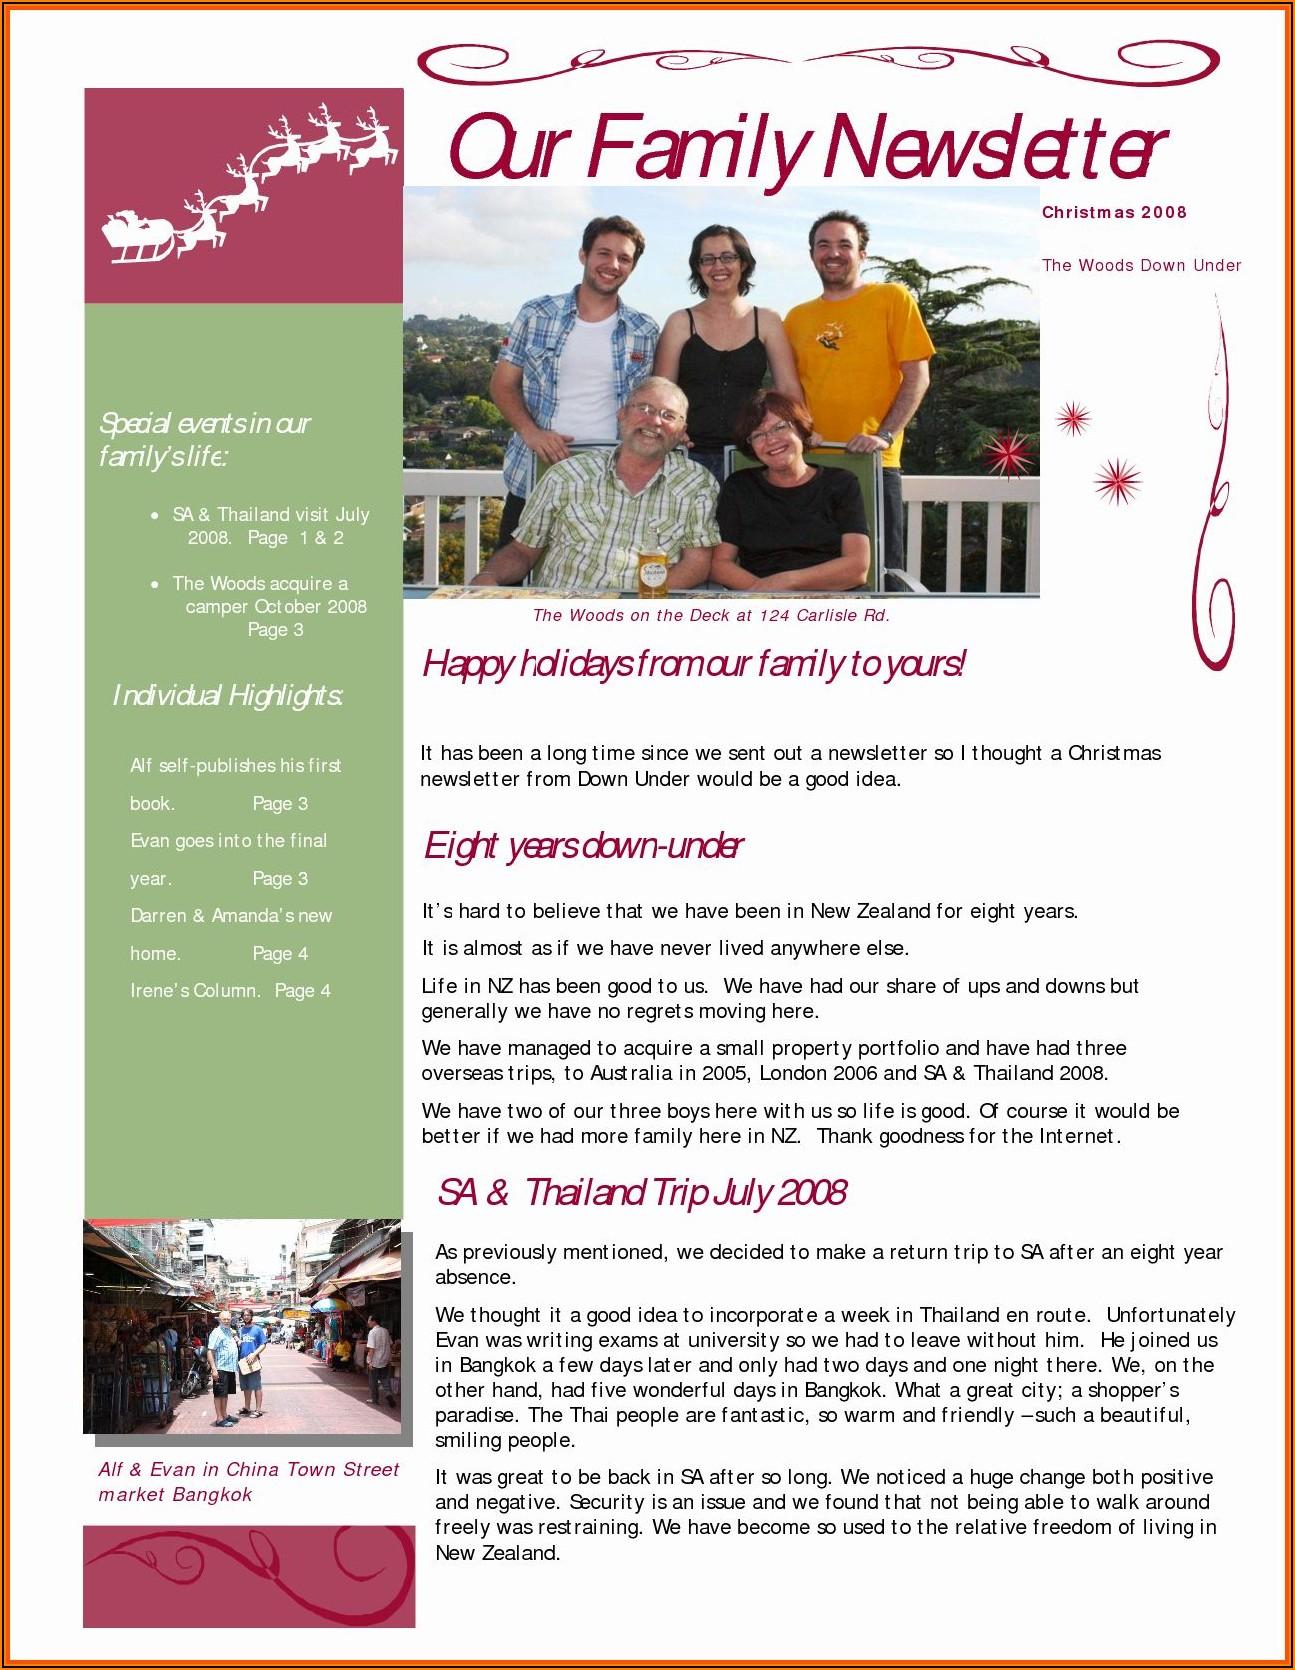 Family Newsletter Template Microsoft Word